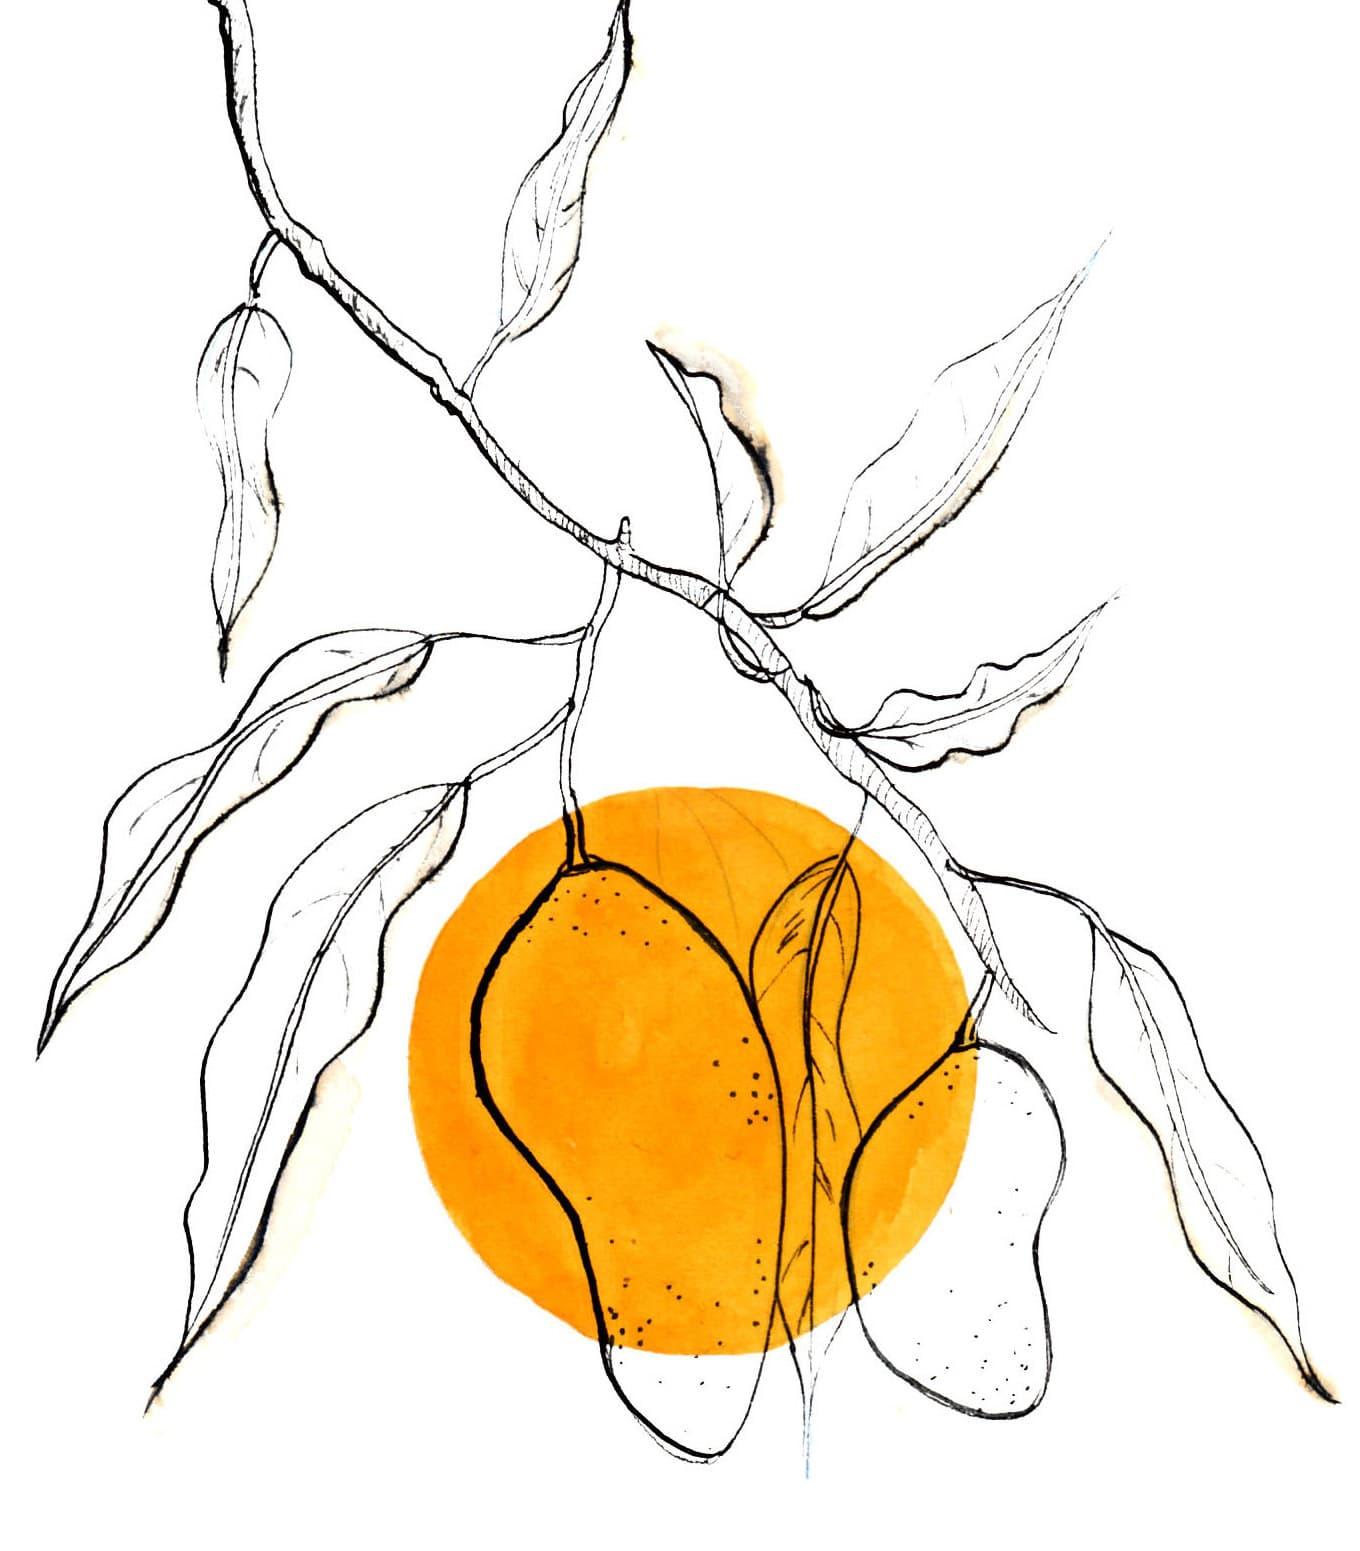 sessertmangue vin mango wine